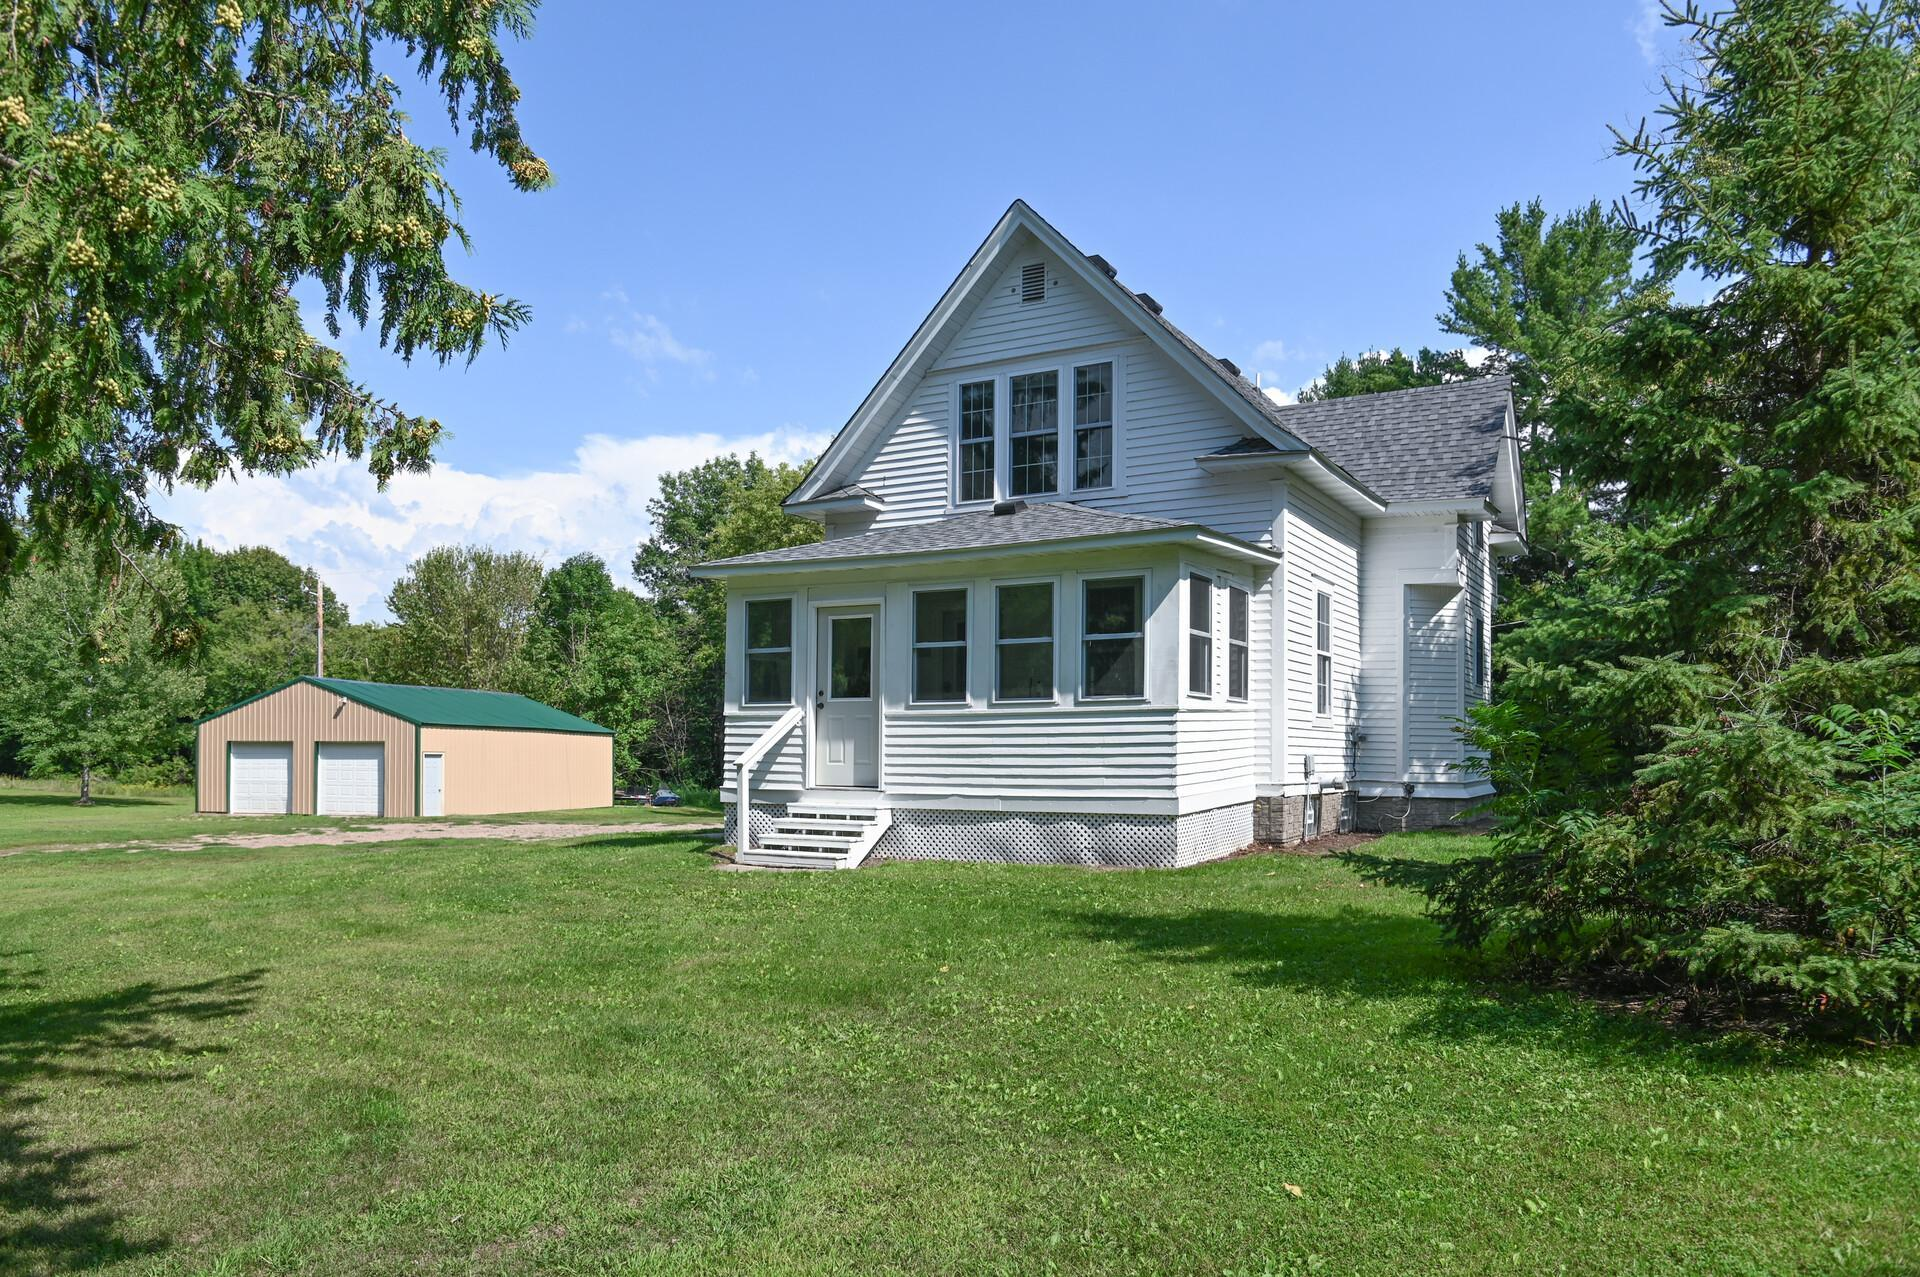 46875 Cedarcrest Trail Property Photo - Harris, MN real estate listing